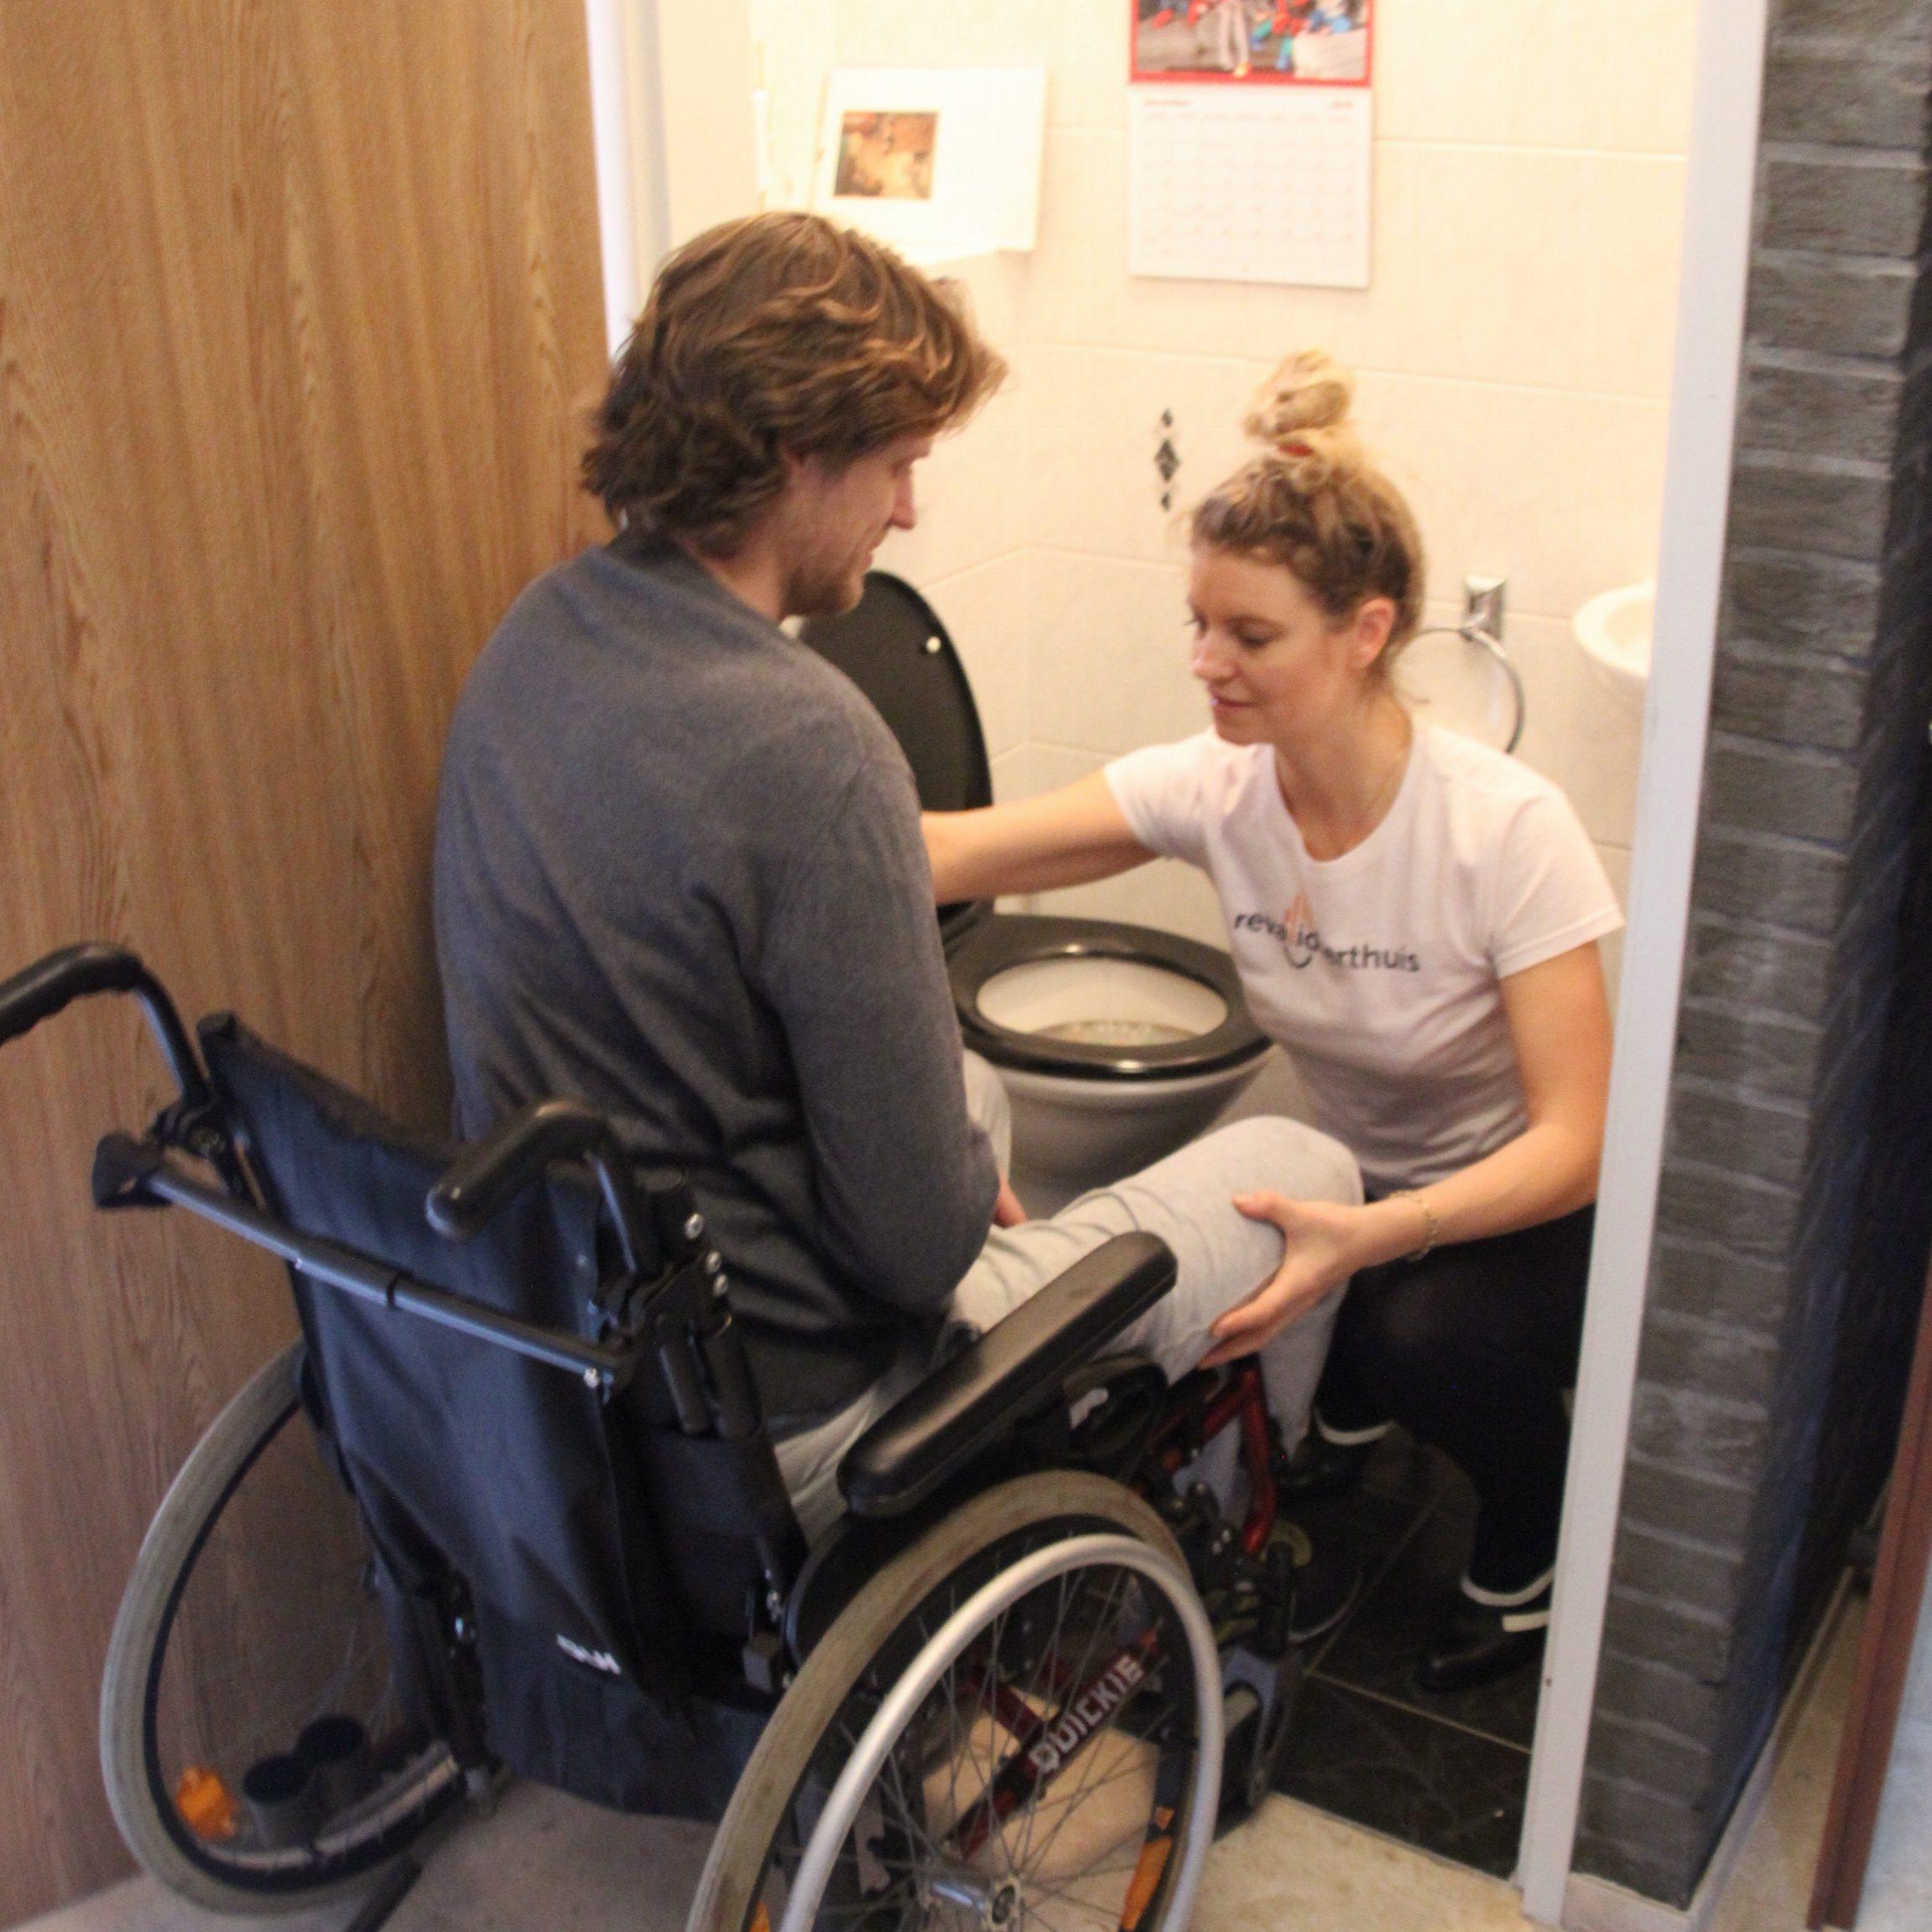 transfer- rolstoel-toilet-training-fysiotherapie- CVA